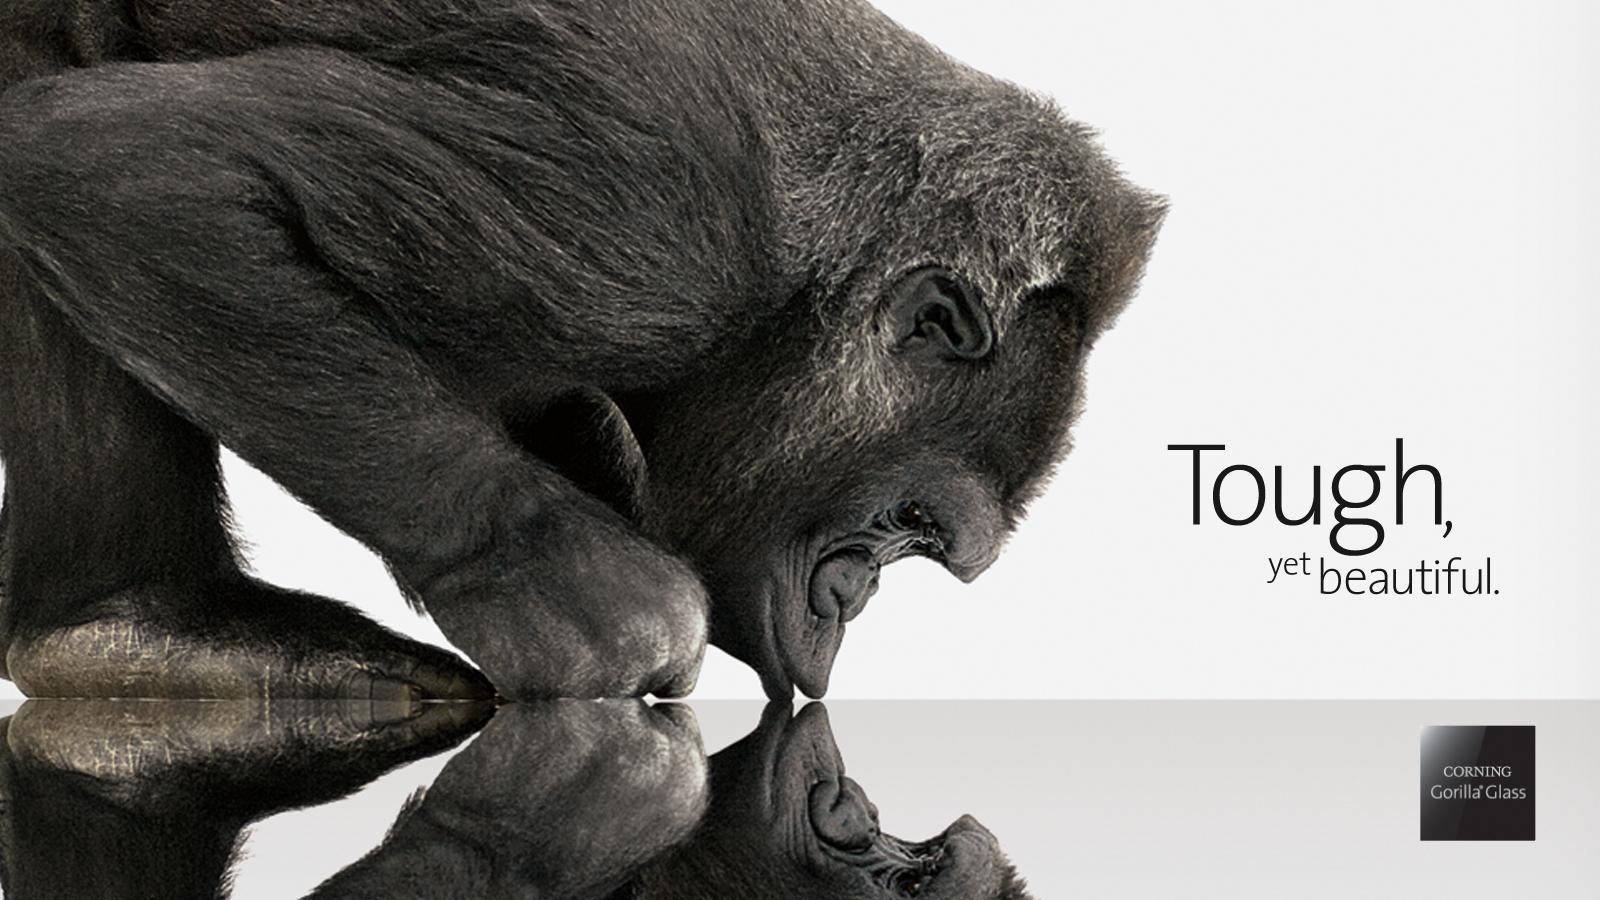 Samsung Buys Share Of Gorilla Glass Maker Corning John Paczkowski